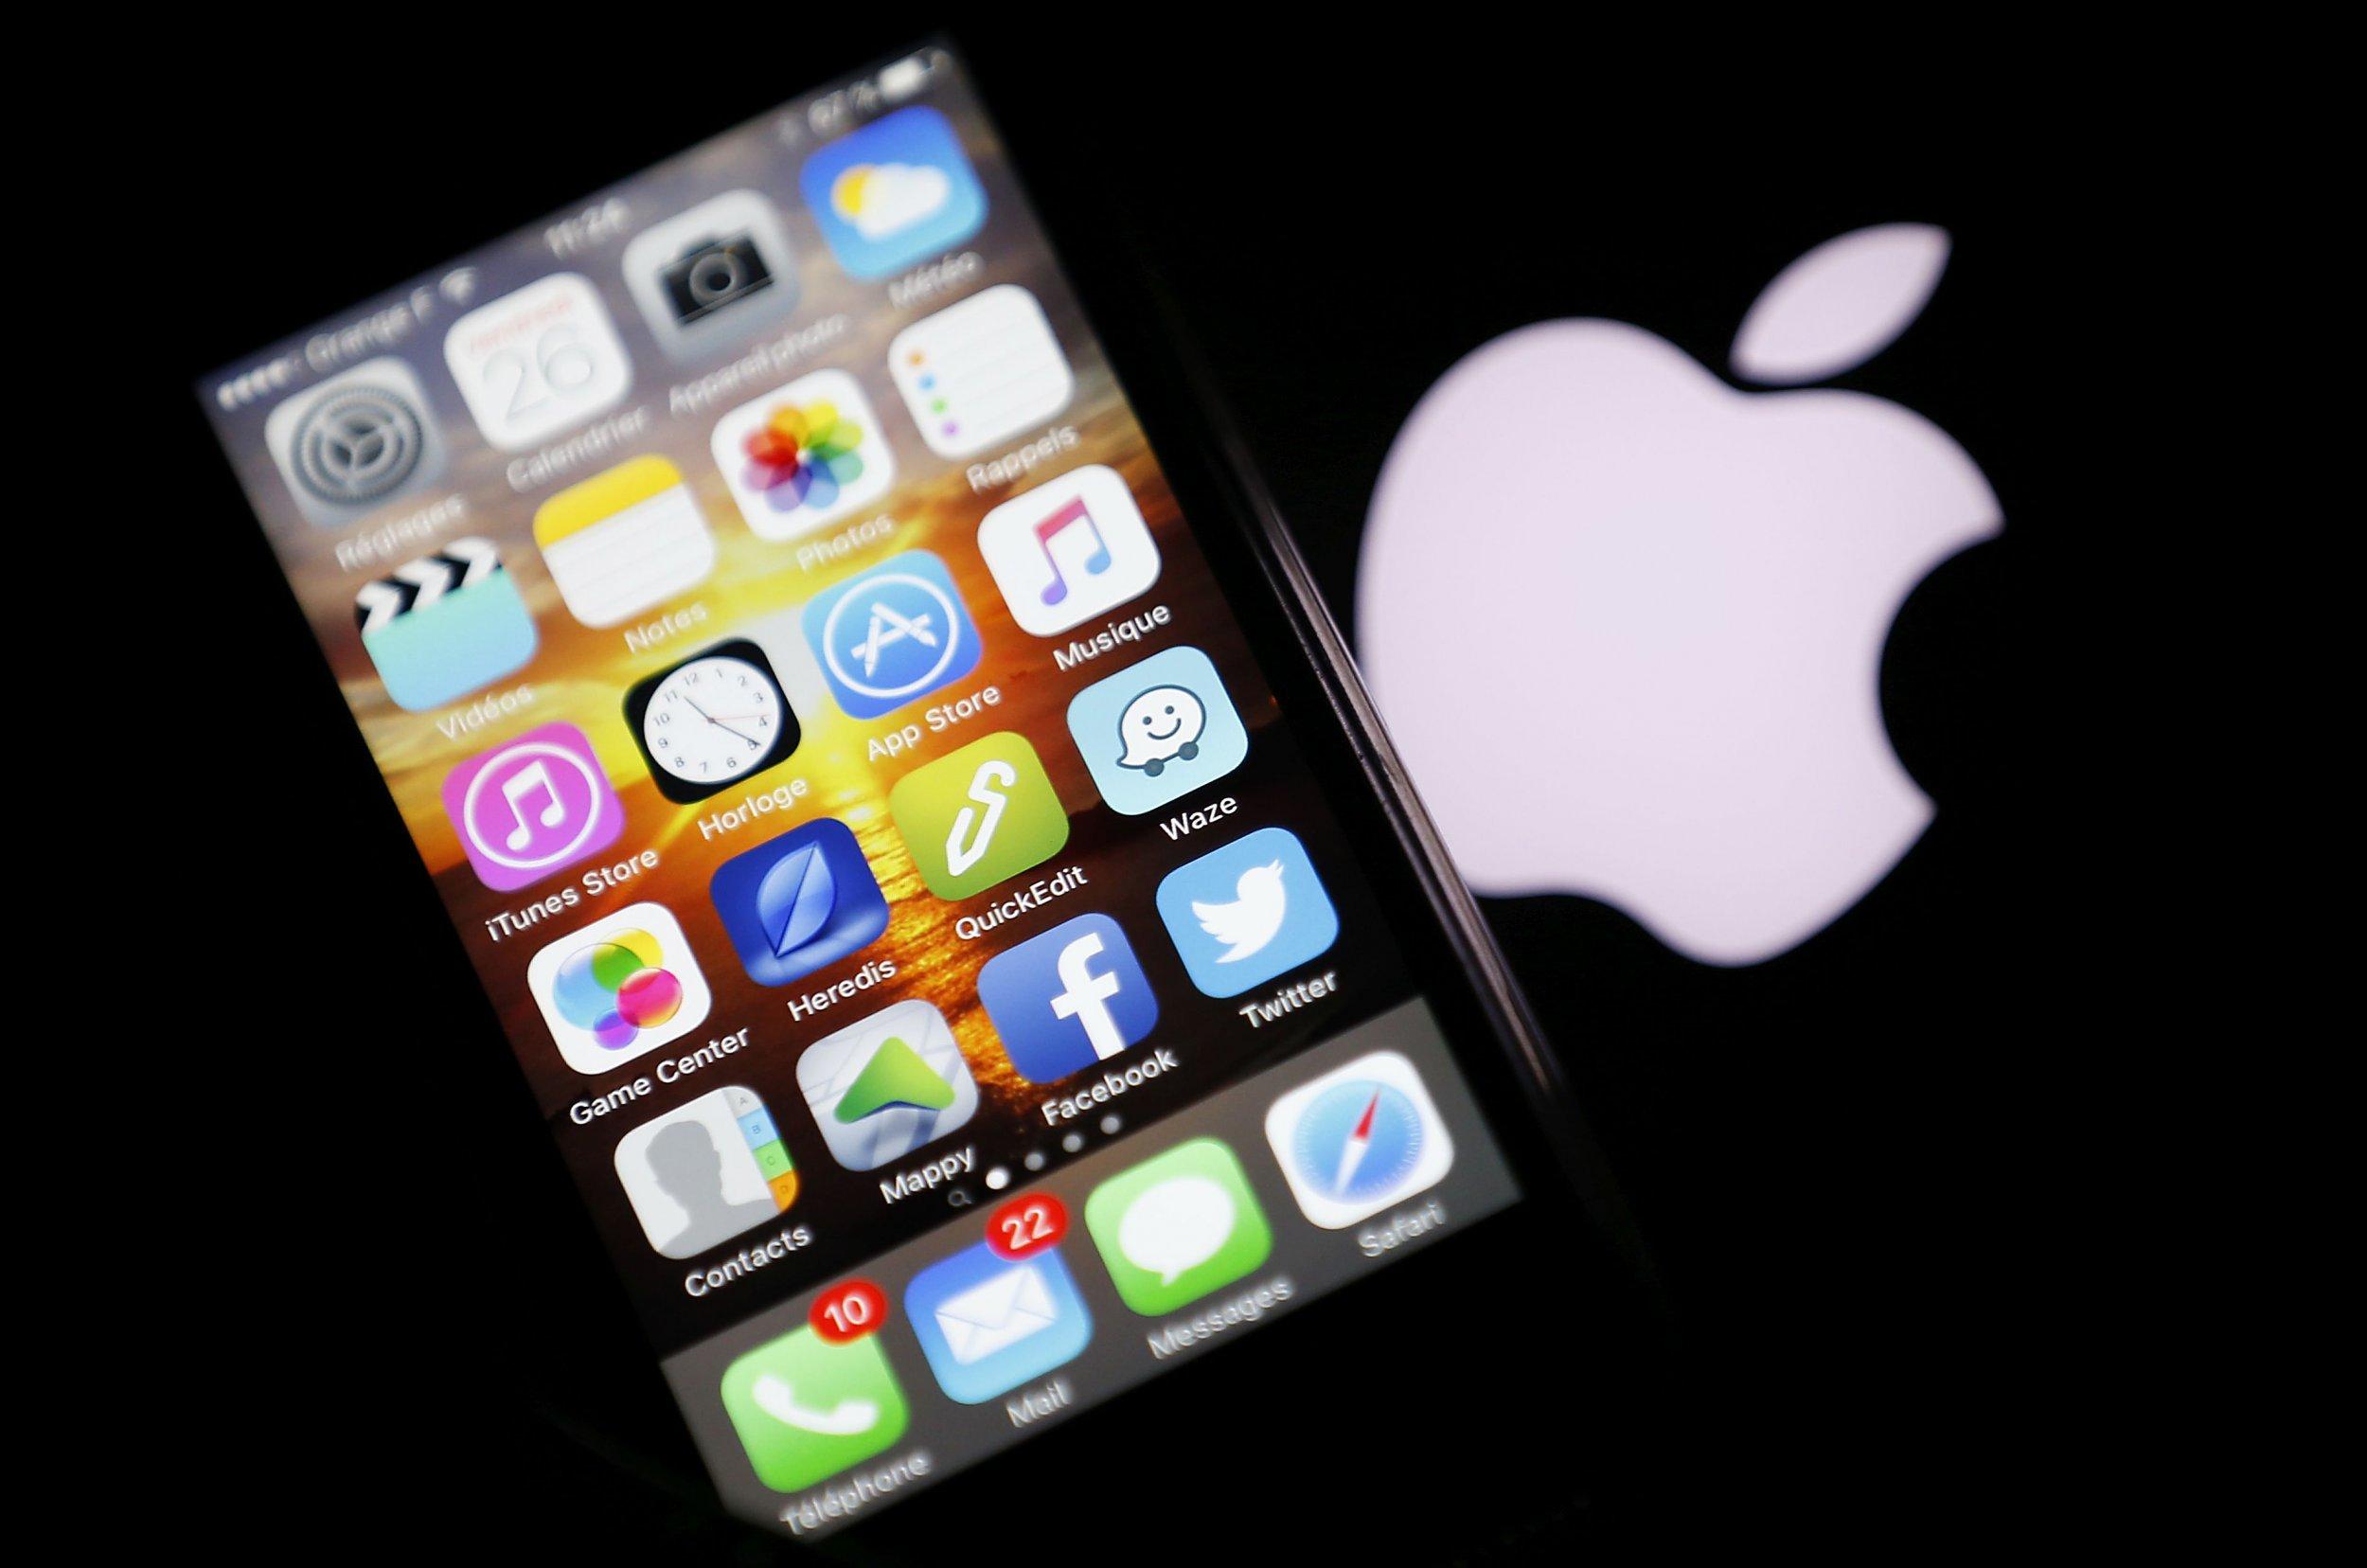 03_03_apple_tech_companies_01